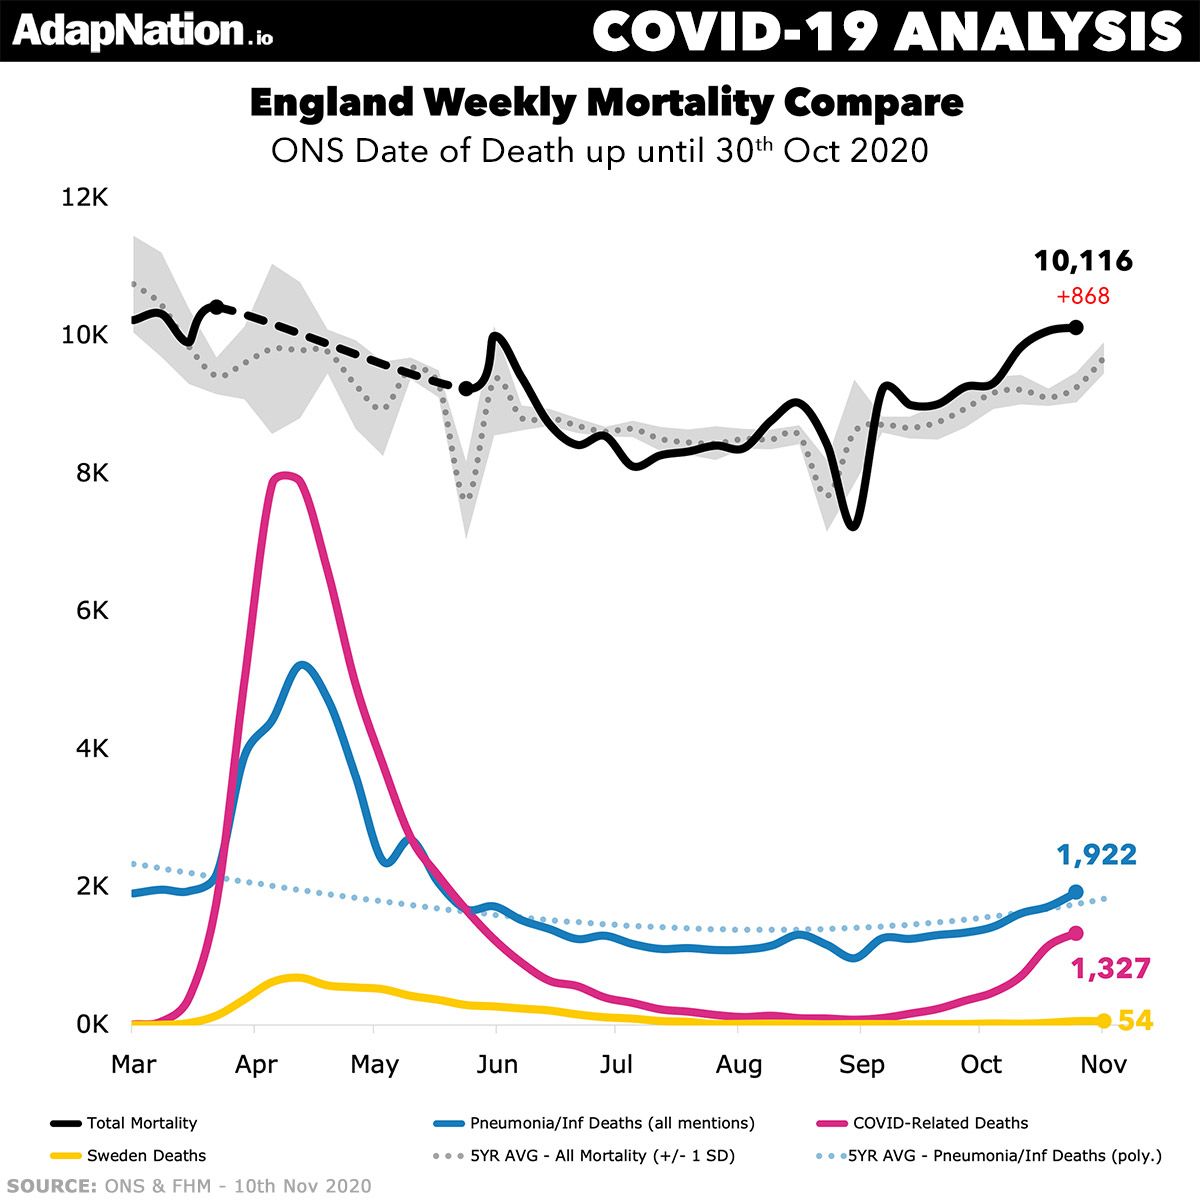 England COVID-19 Update 10th Nov 2020